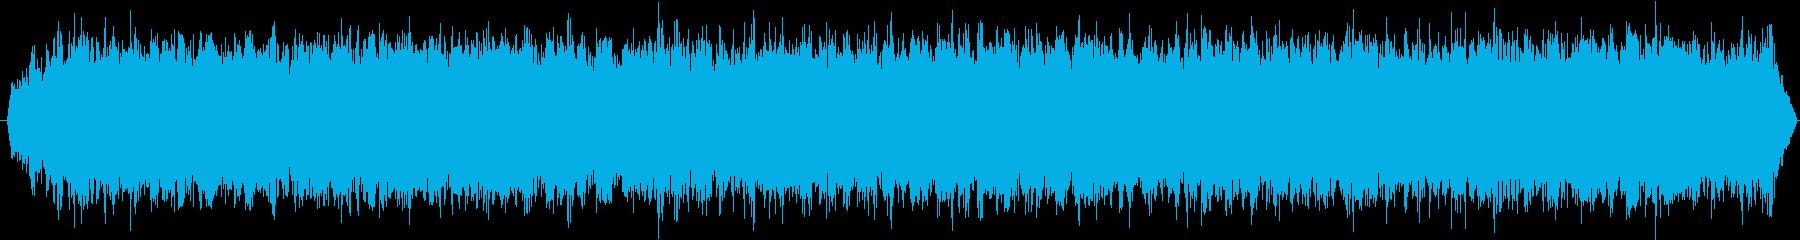 PADS 合唱団ハム03の再生済みの波形